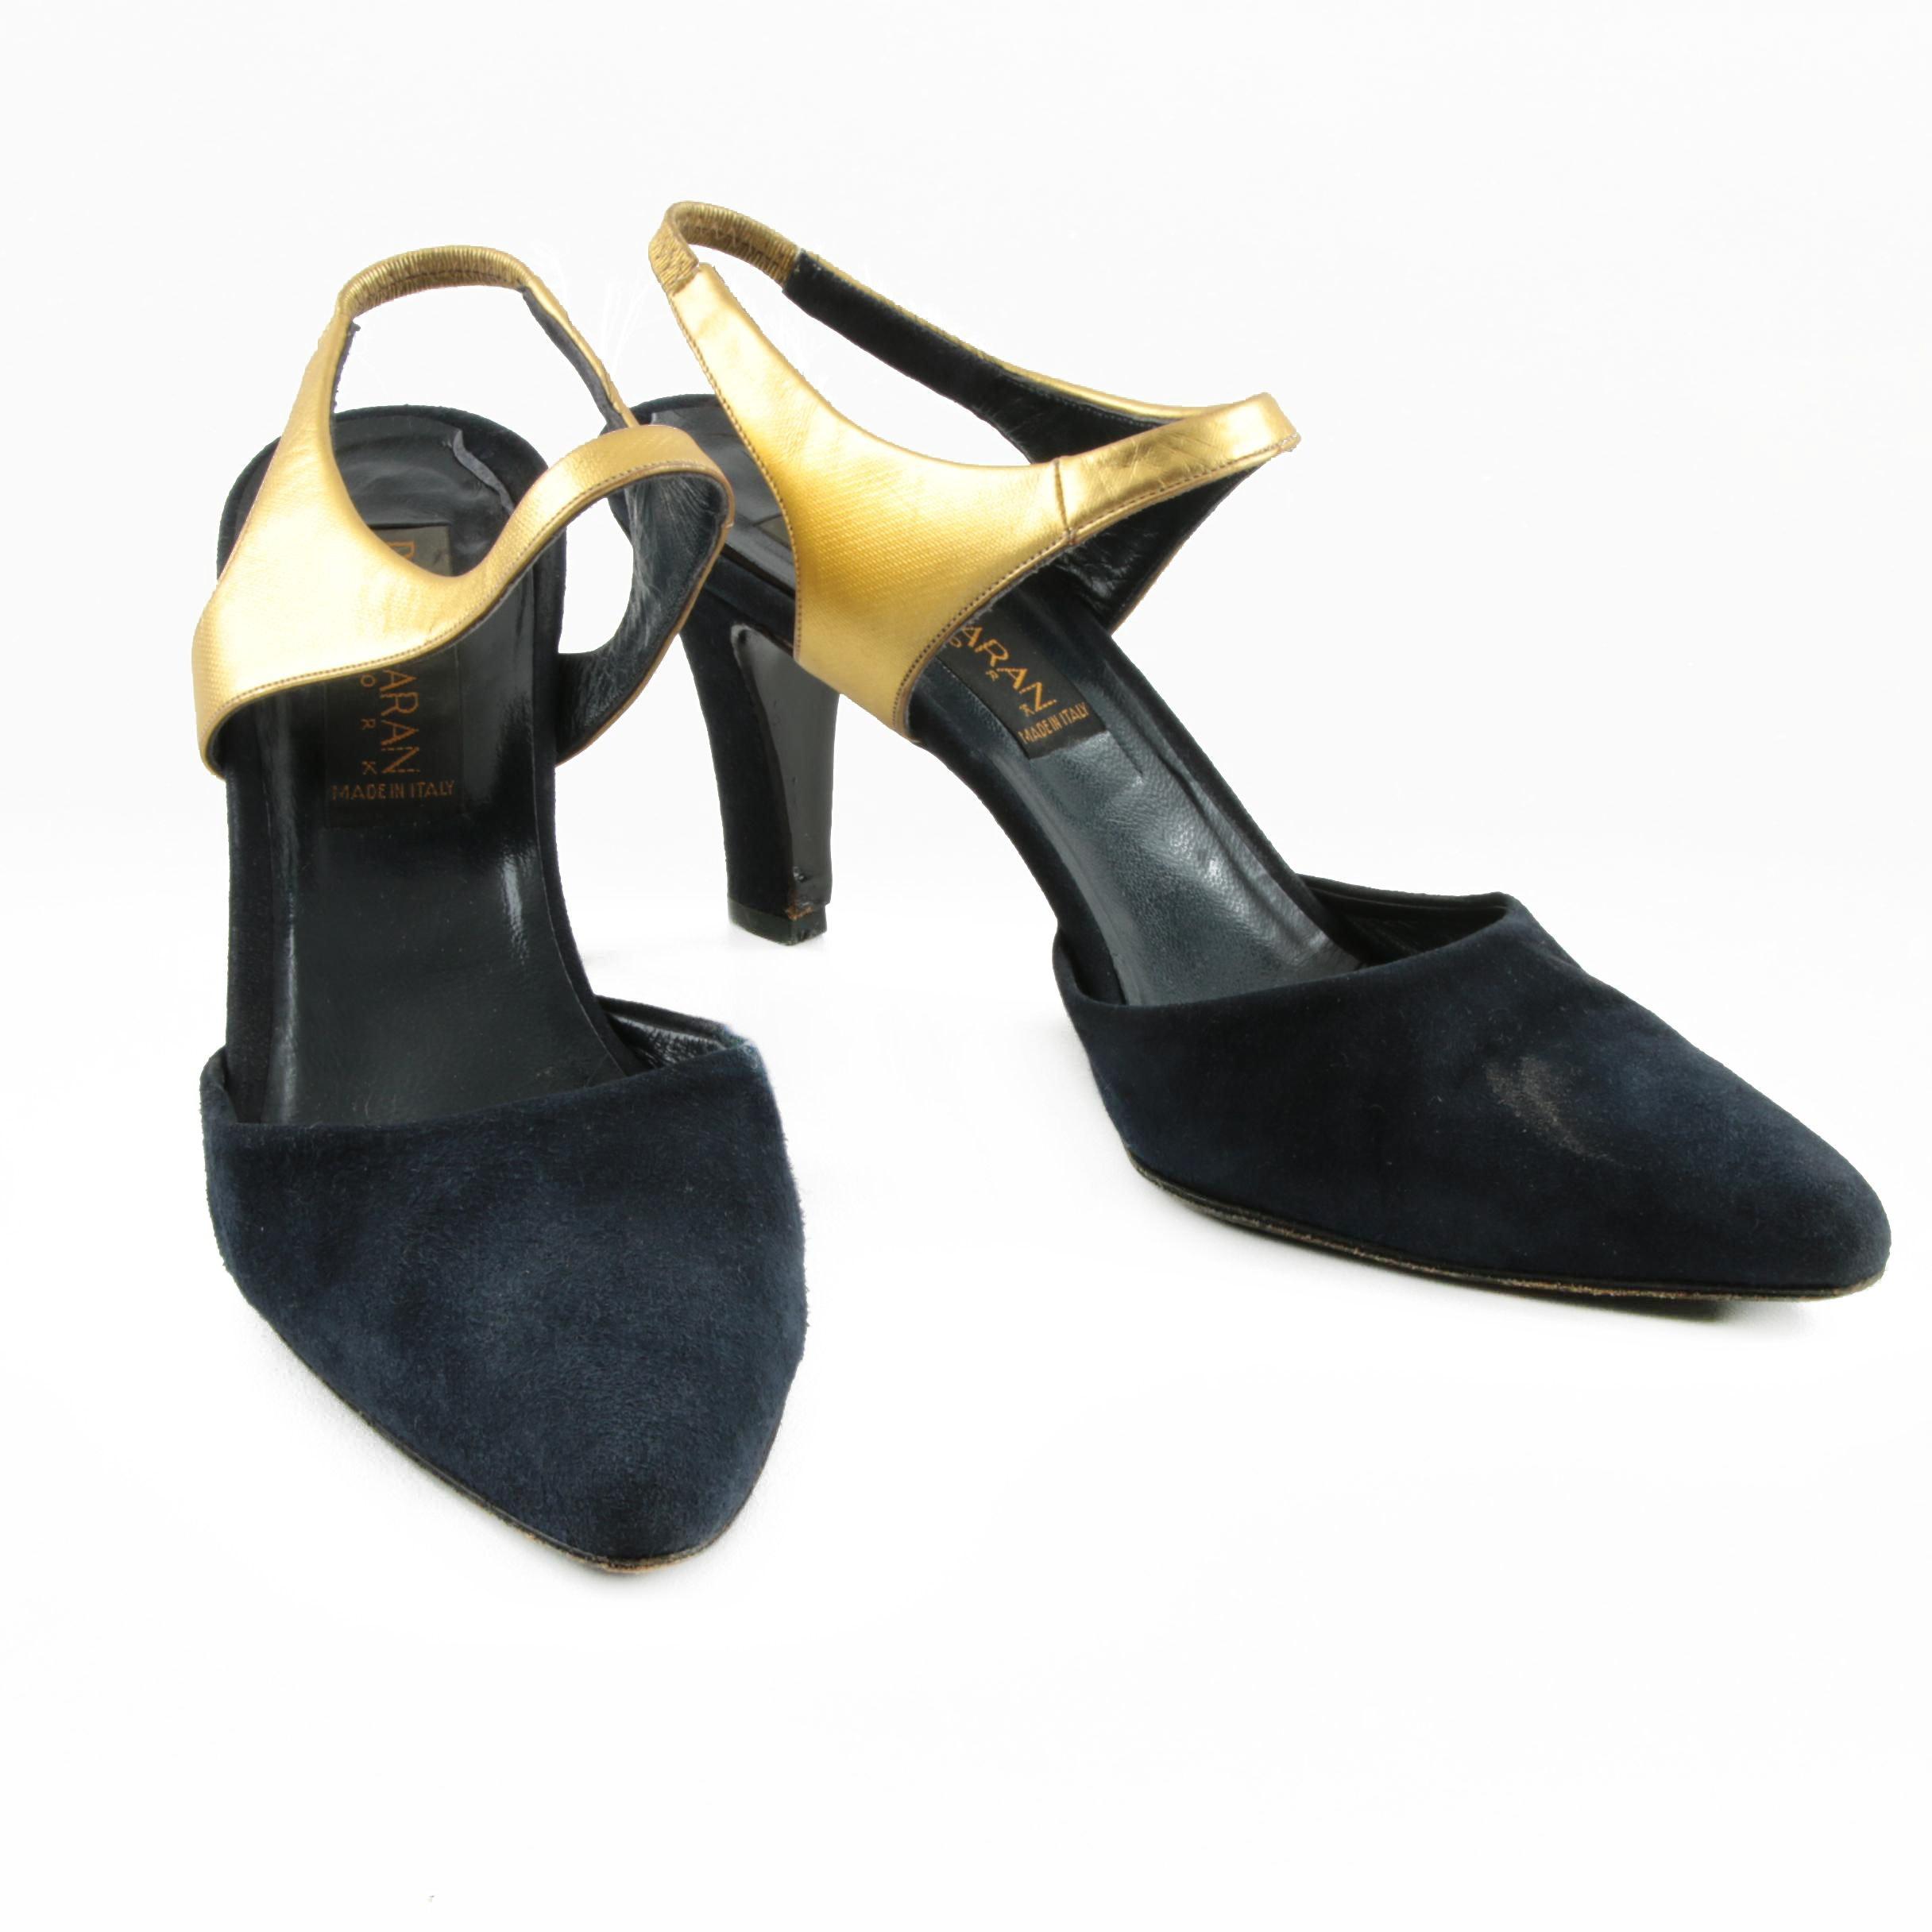 Vintage Donna Karan High Heel Pumps